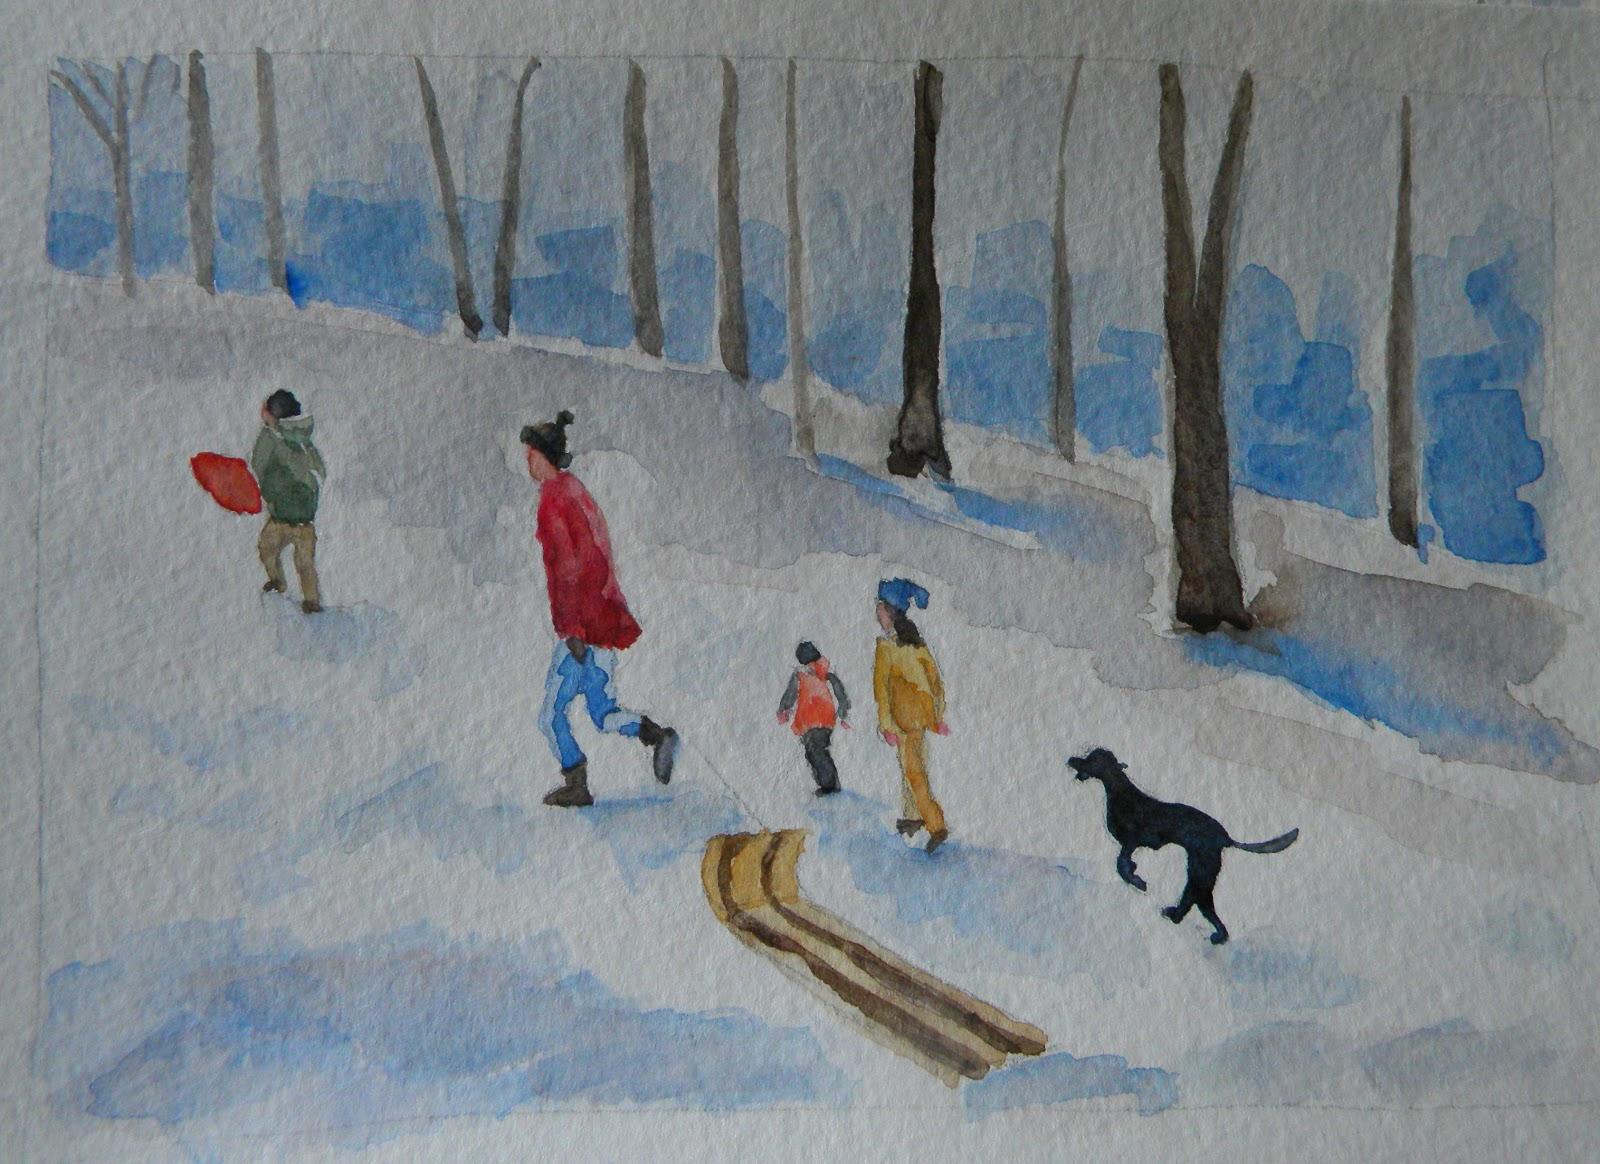 1600x1164 Painting Daily Heidi Malott Original Art Kids Sledding Winter